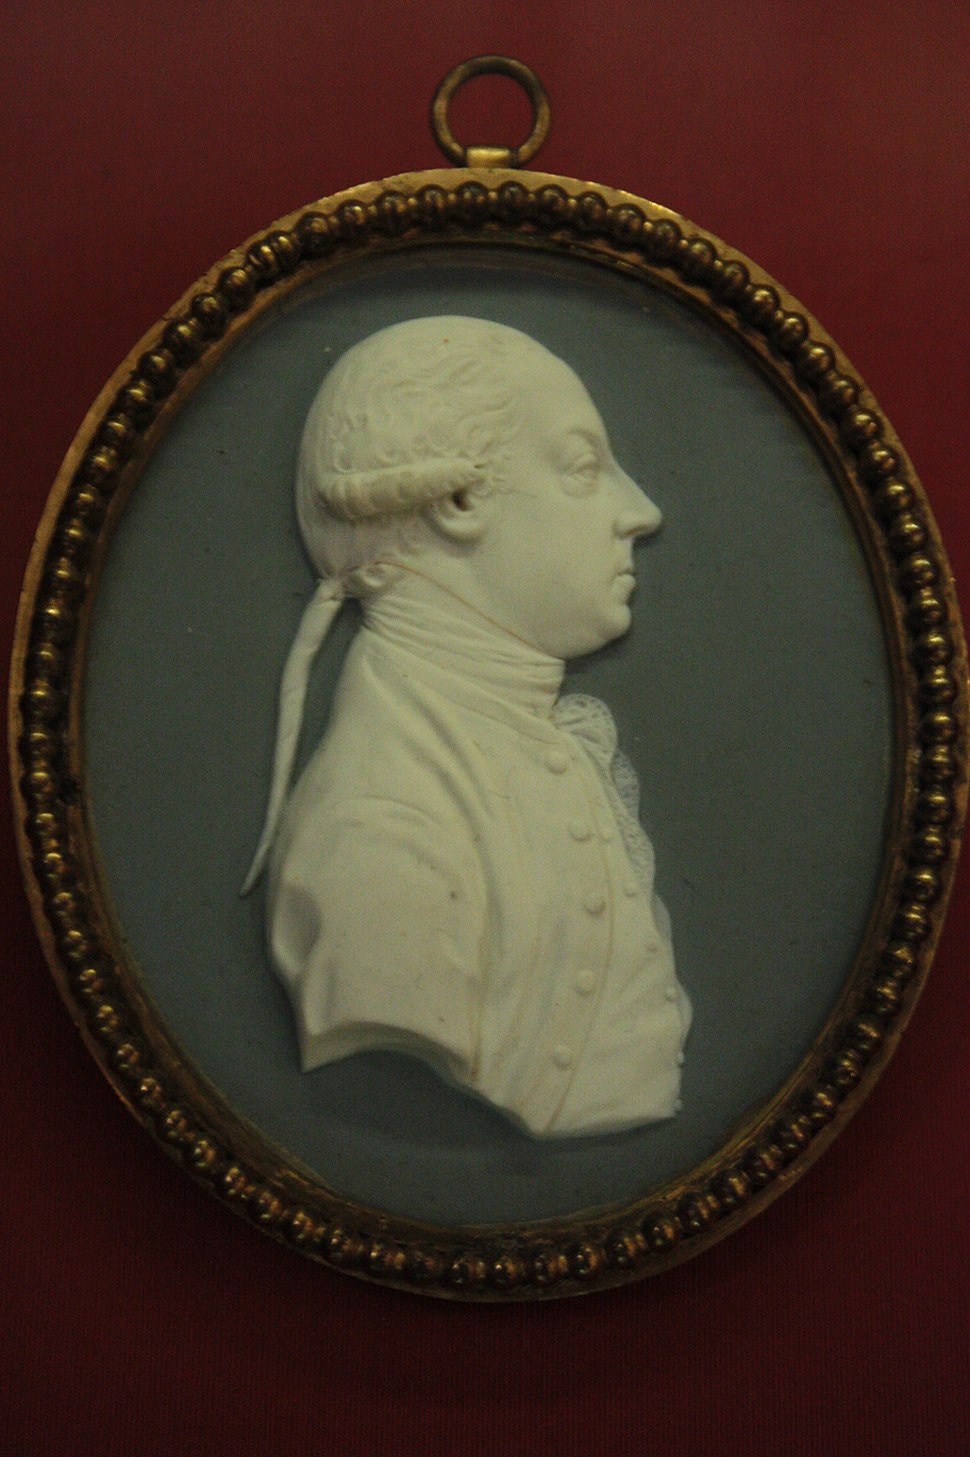 Thomas Pennant, miniature by Josiah Wedgewood